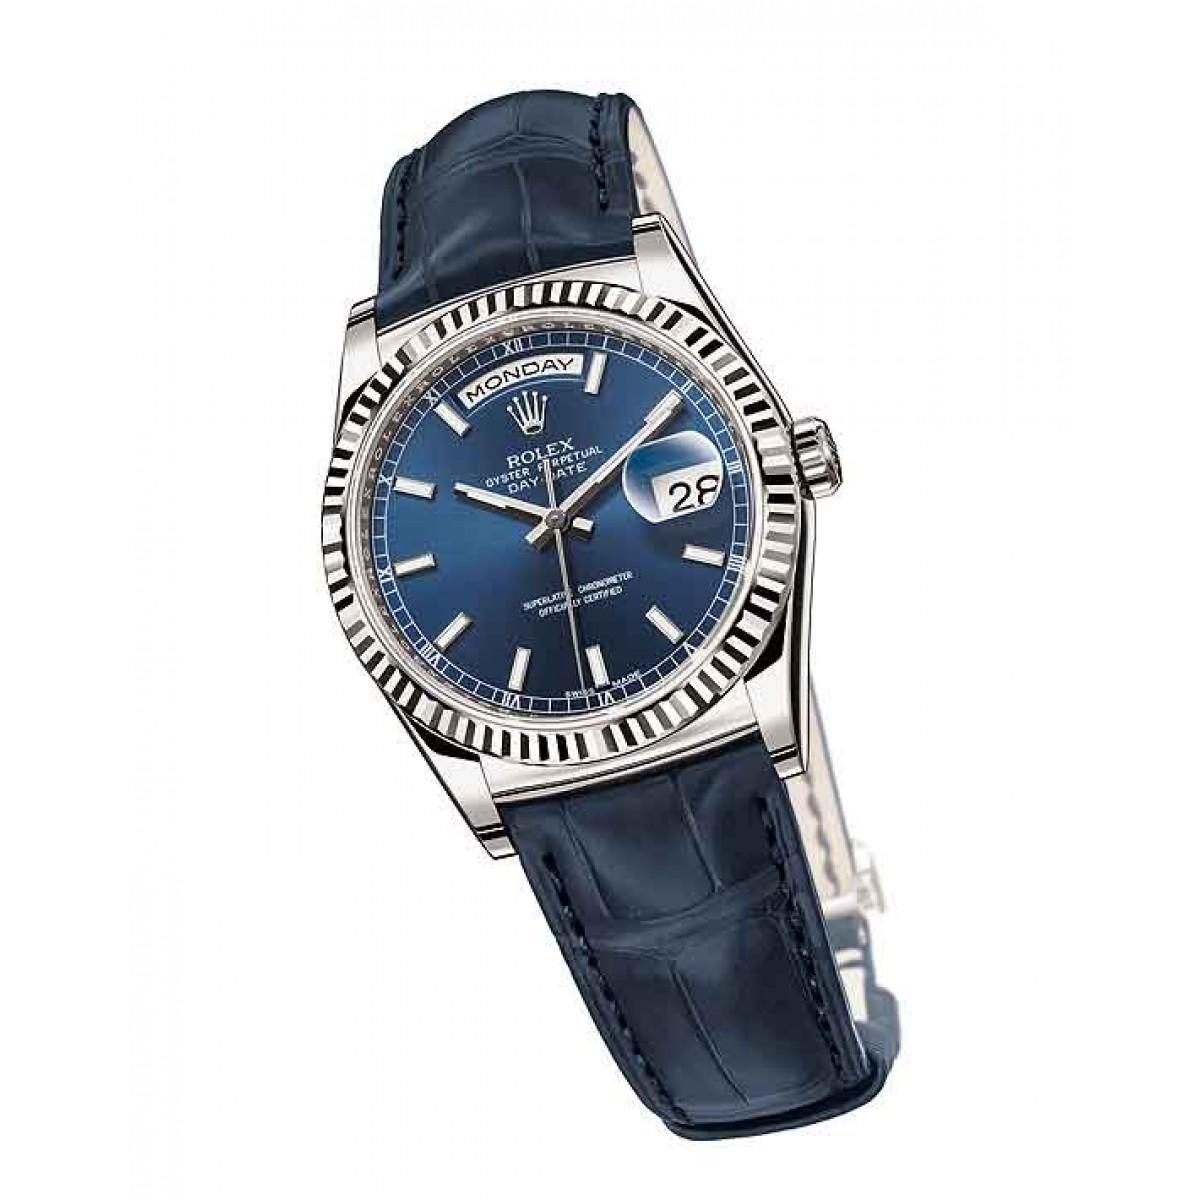 Rolex day date price